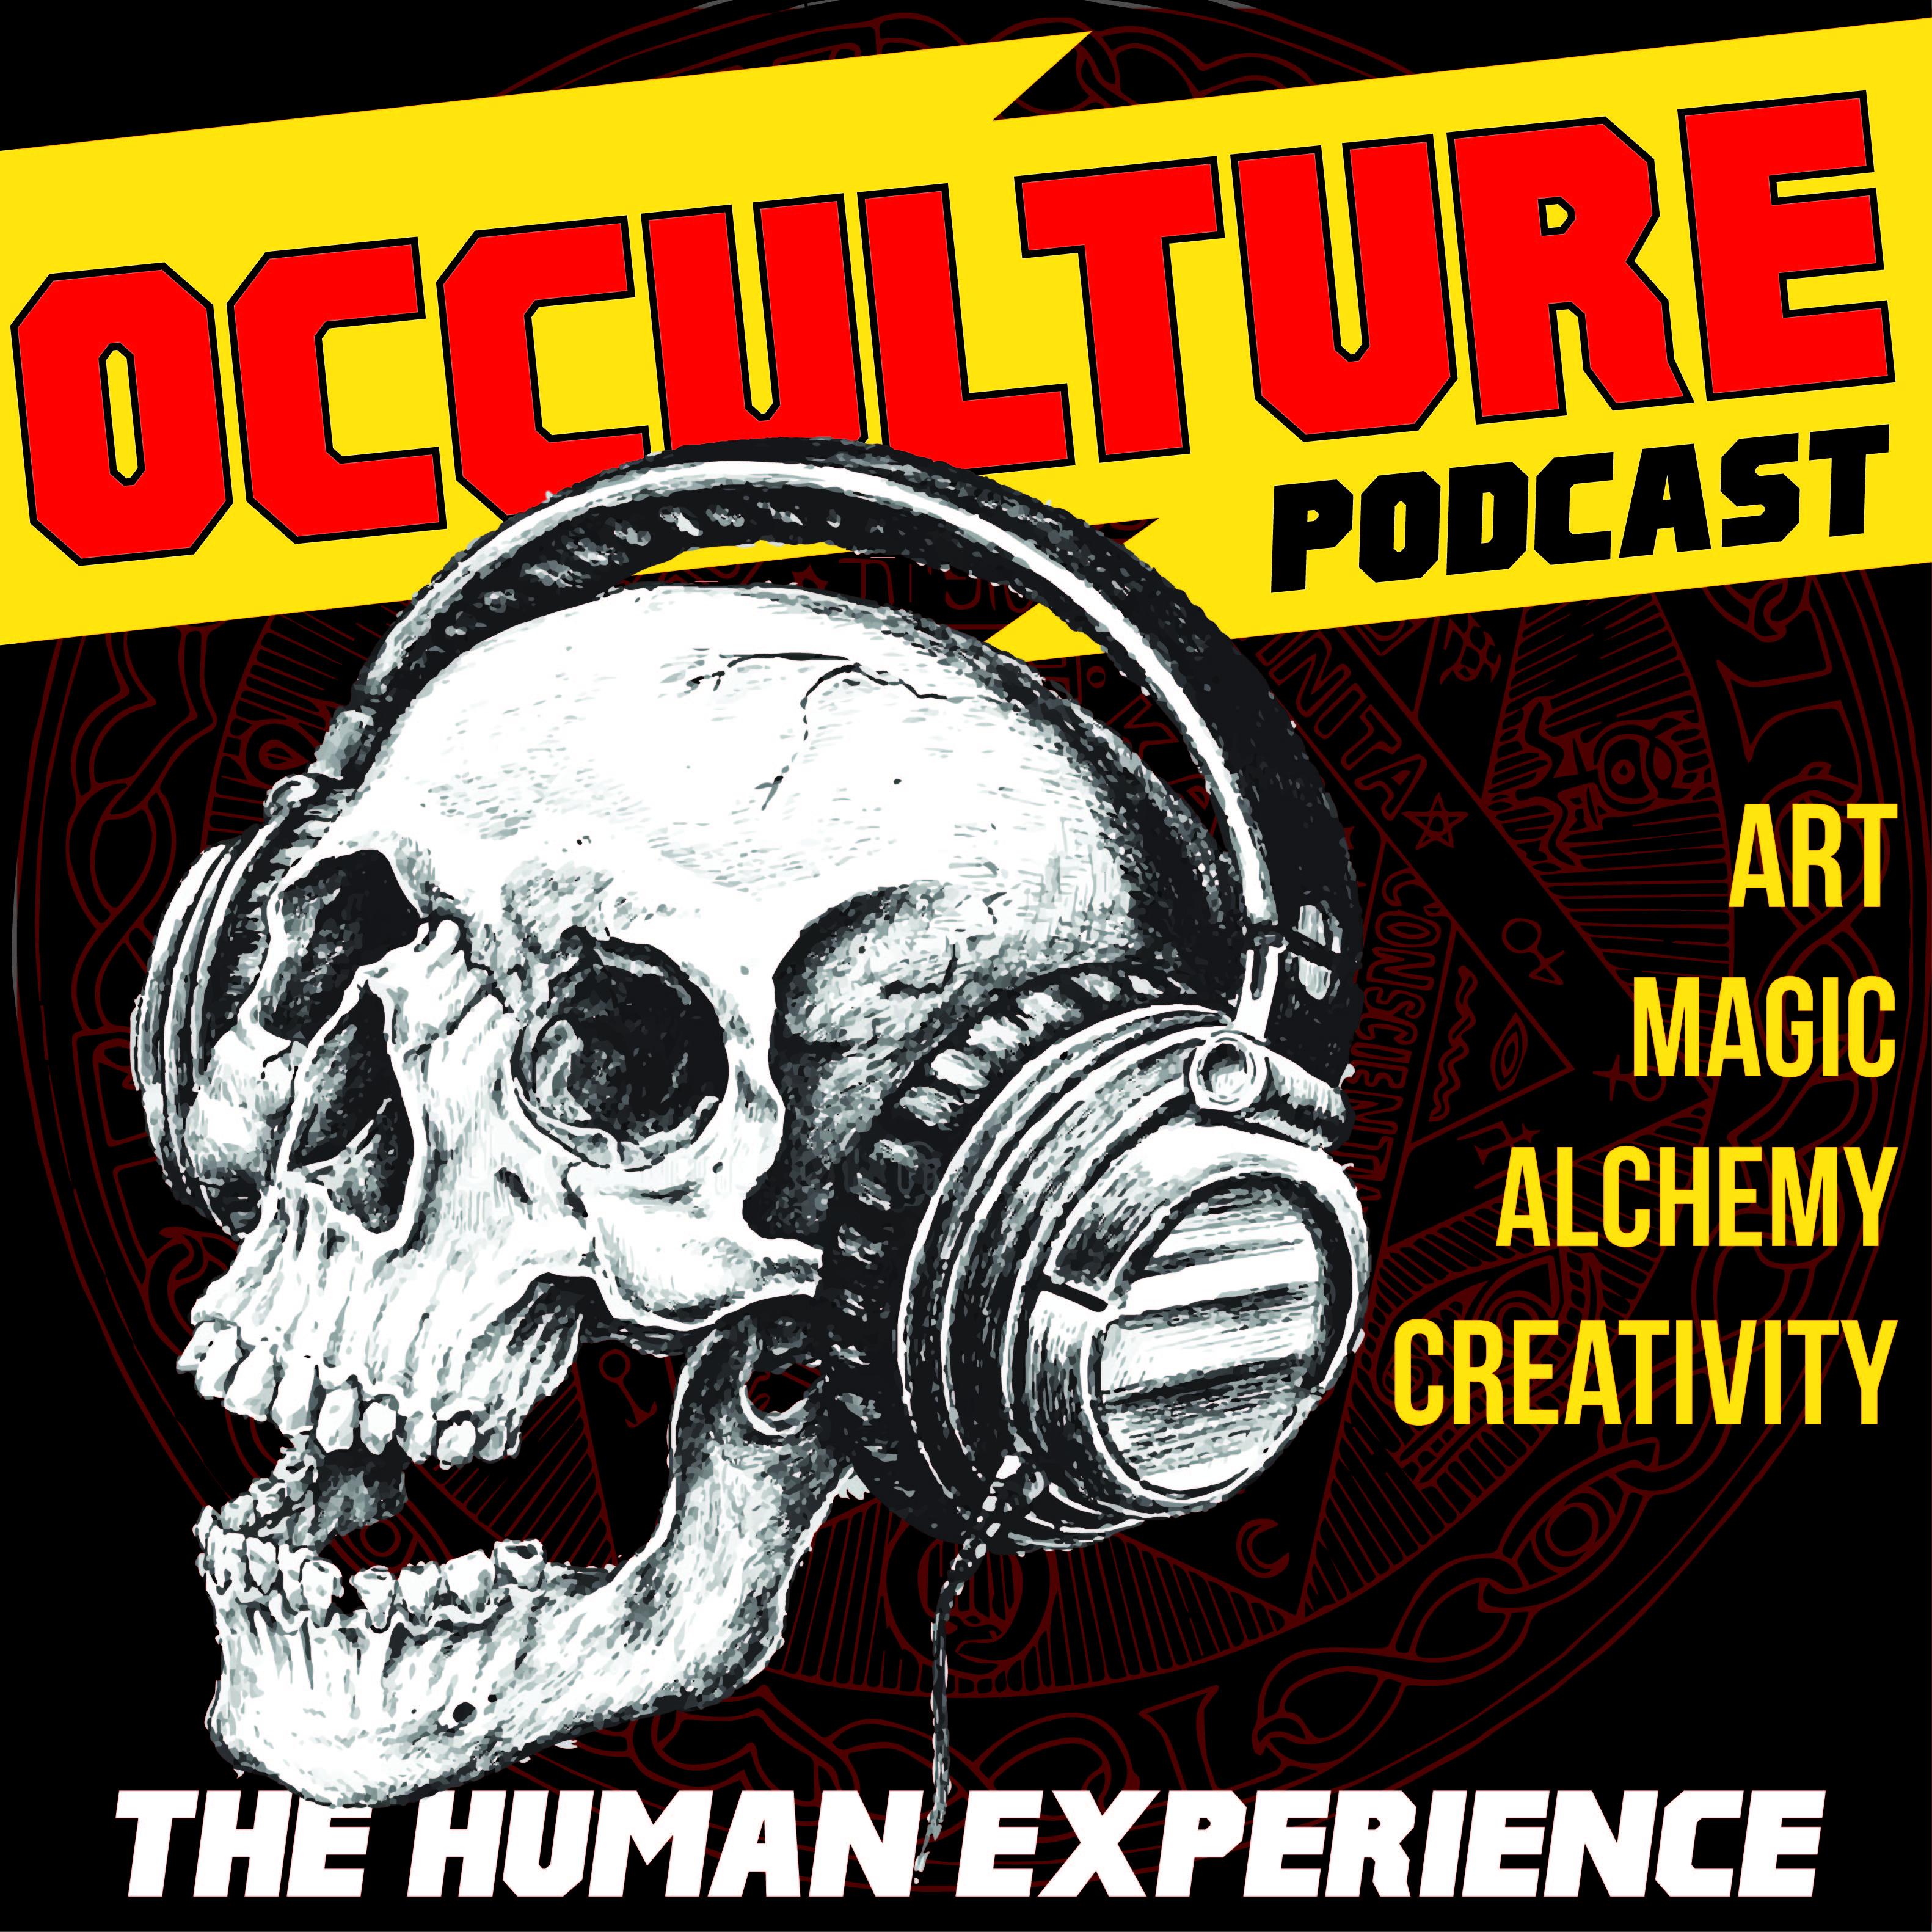 OCCULTURE show art